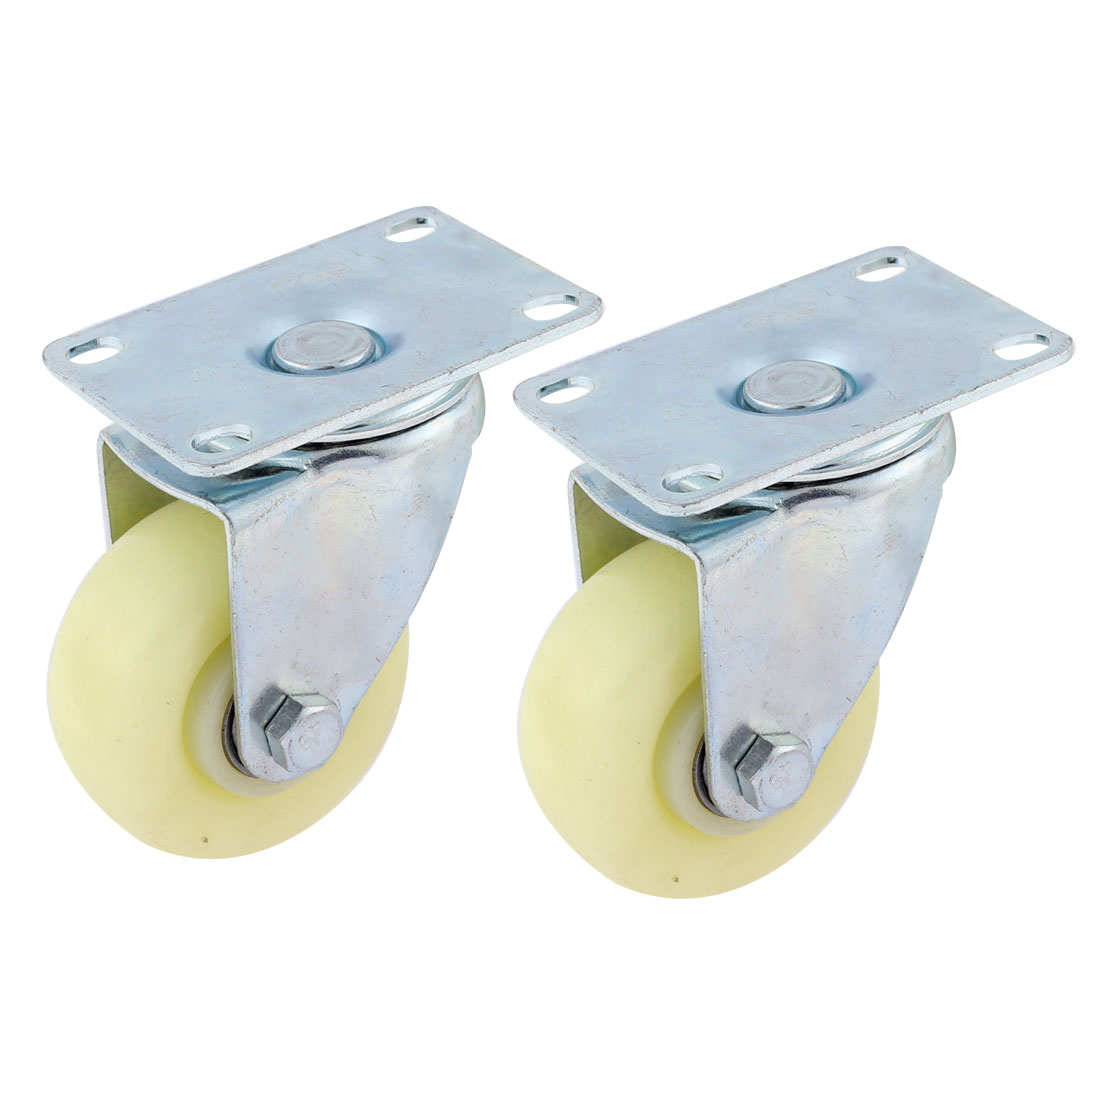 2pcs White Plastic 360 Degree Wheels Metal Top Plate Swivel Caster 75mm Dia